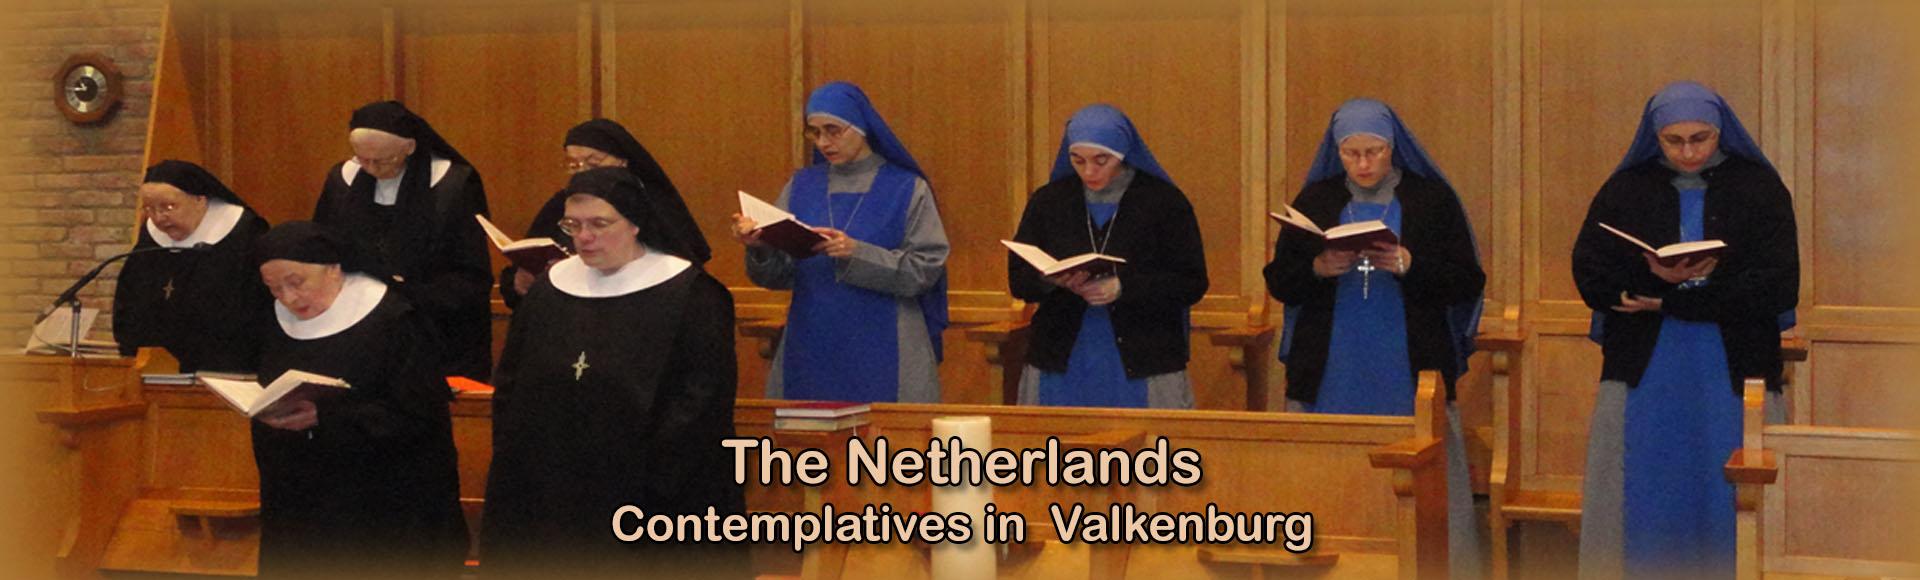 SSVM-Servants-of-the-Lord-Netherlands-Contemplatives